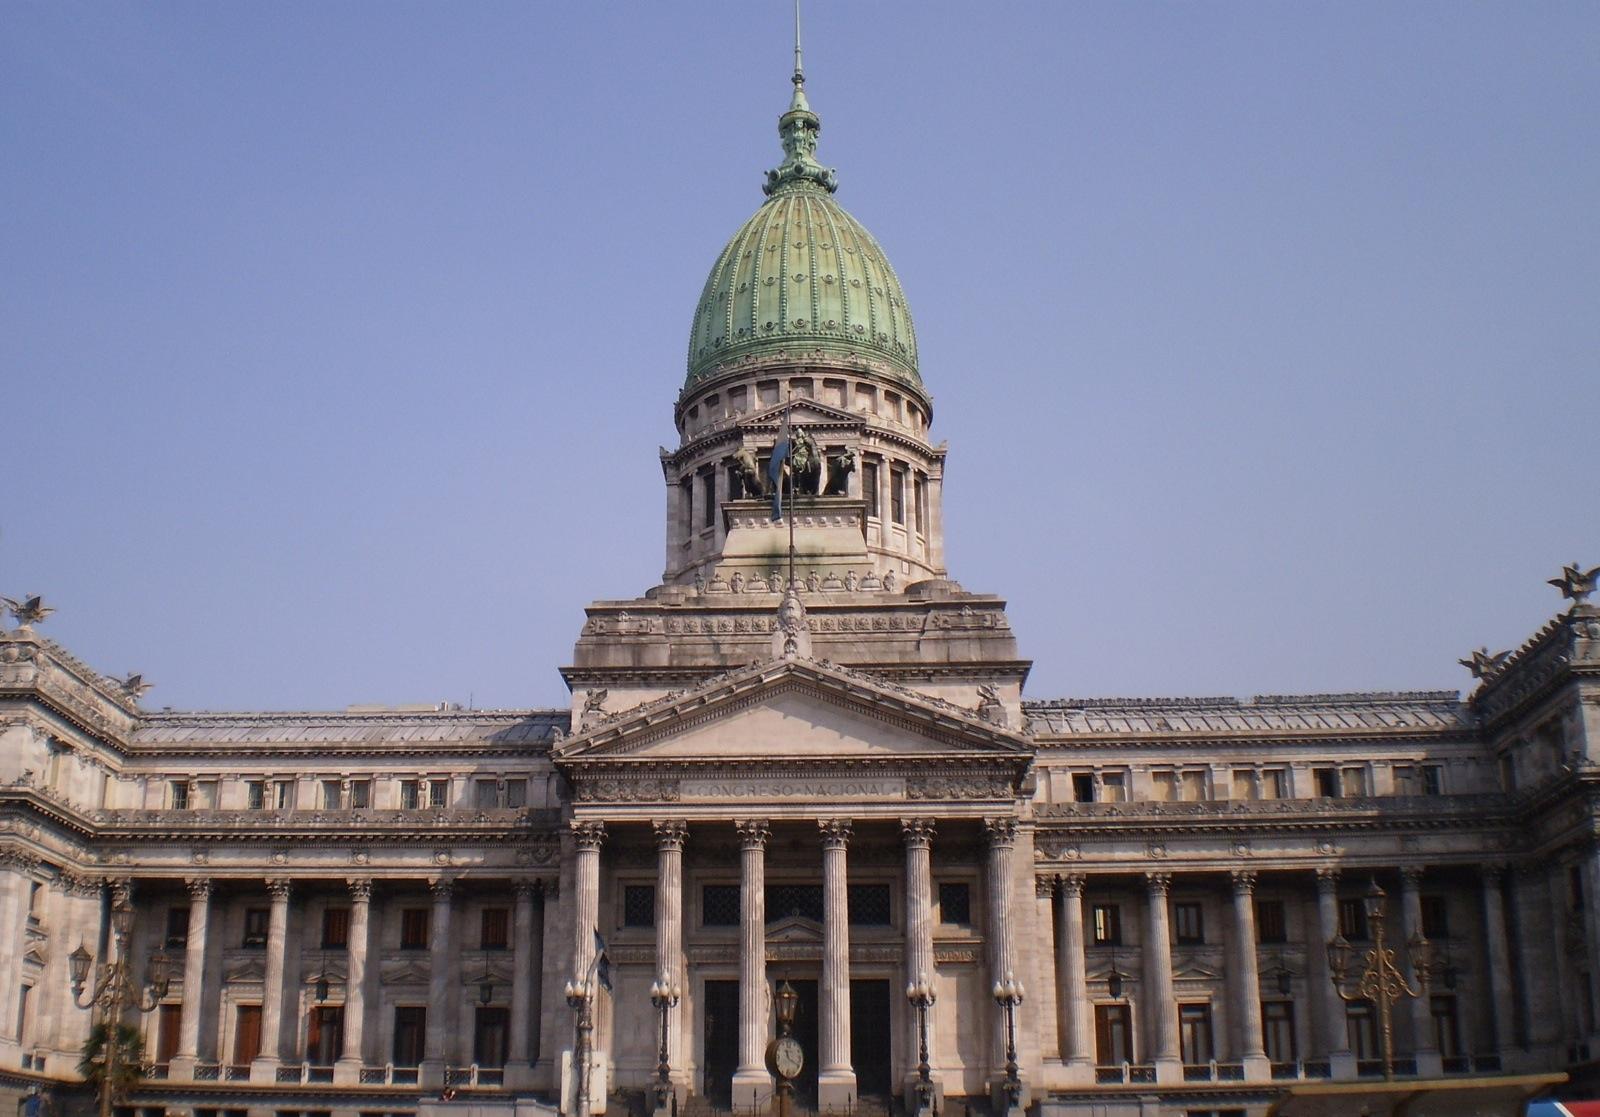 Proyecto de reforma tributaria